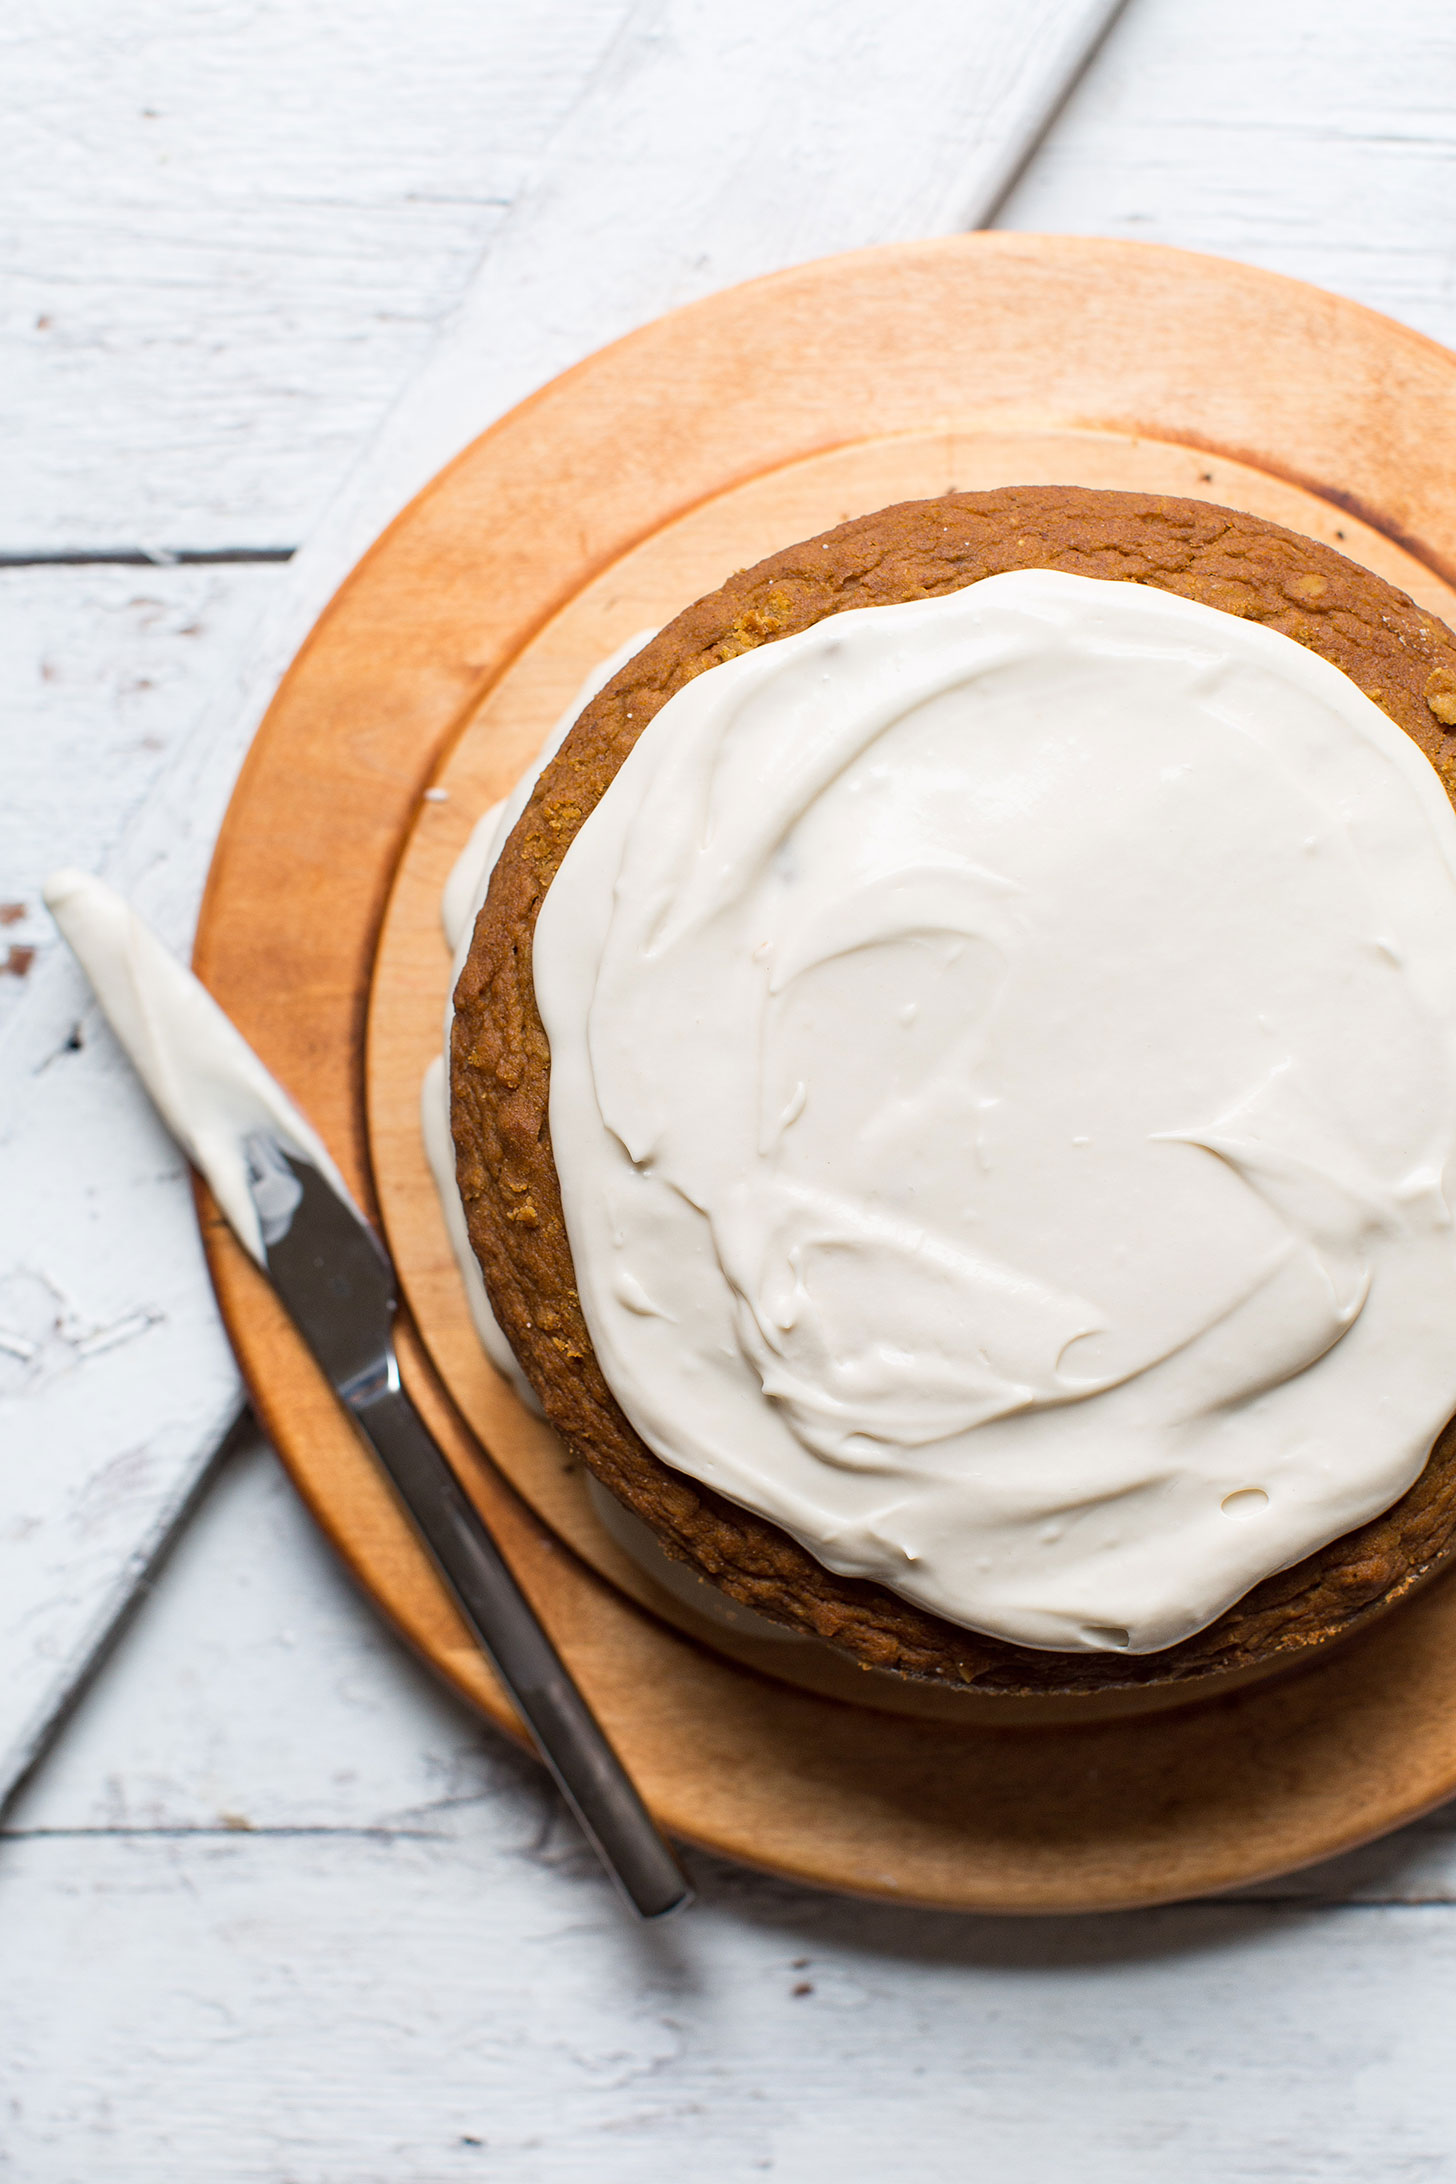 Spreading homemade vegan frosting onto our gluten-free Pumpkin Cake